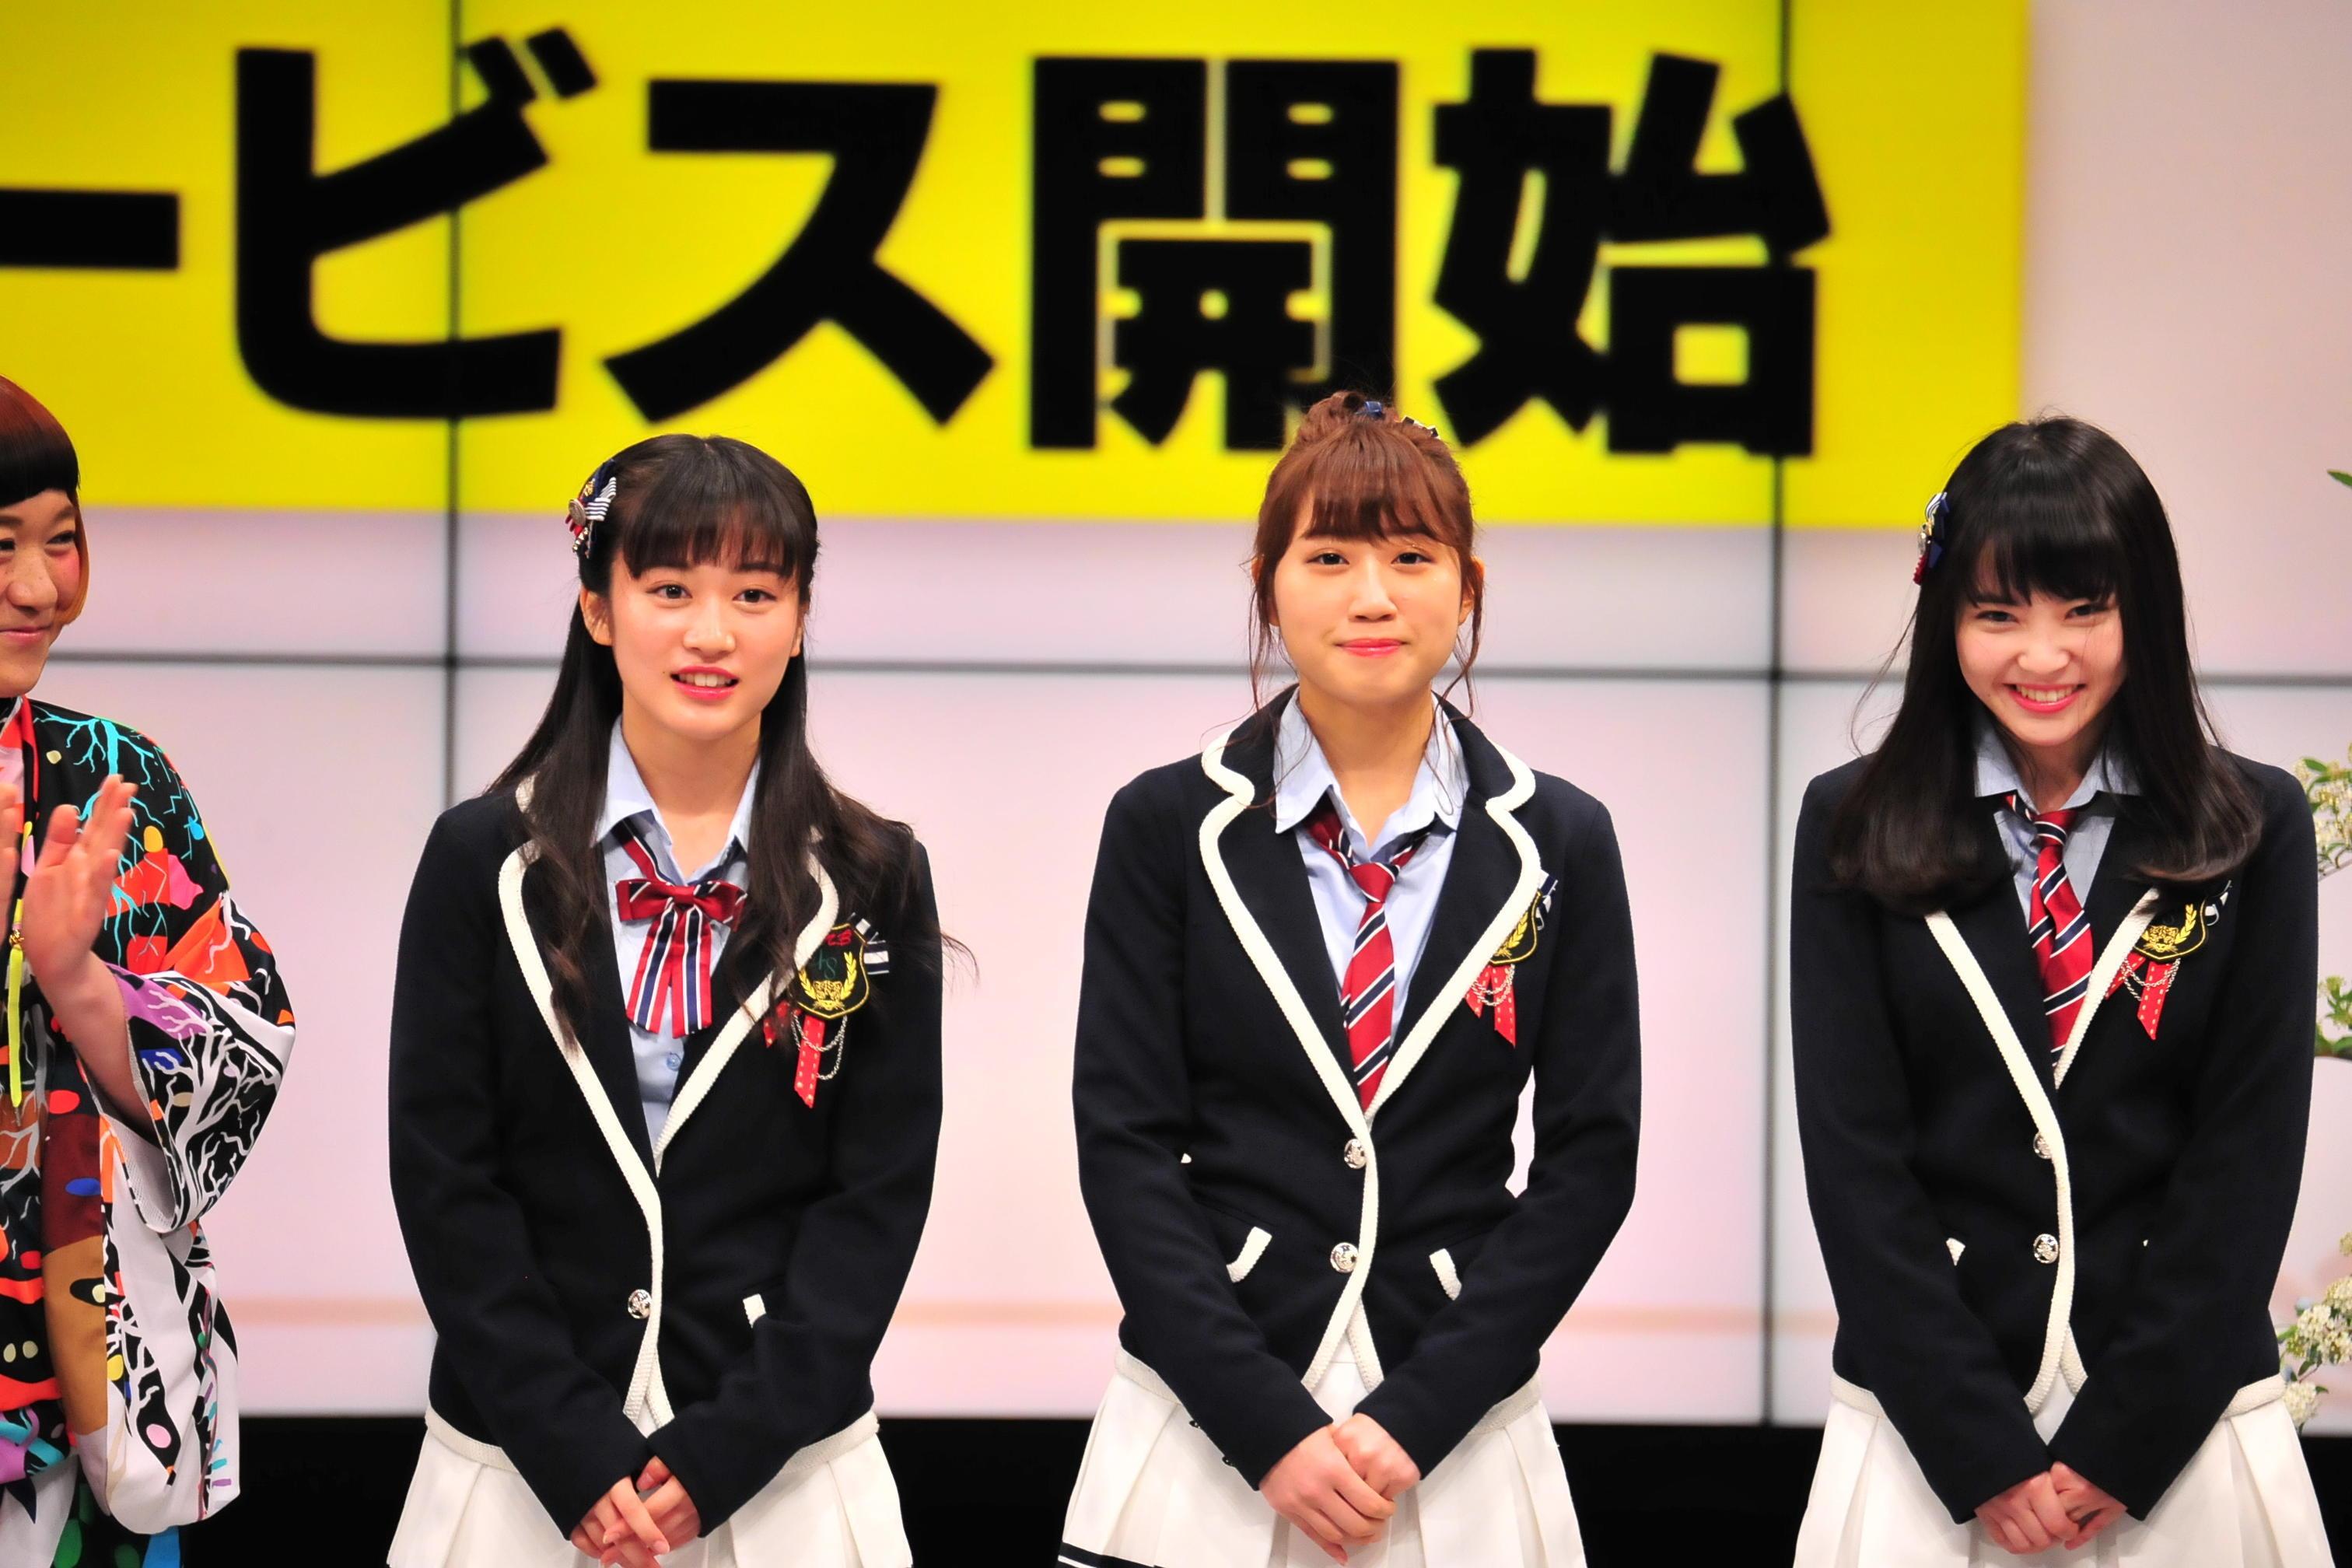 http://news.yoshimoto.co.jp/20170425155927-b1c7e390ba074d1a3c206d1f7d06b6dd18d87f2c.jpg